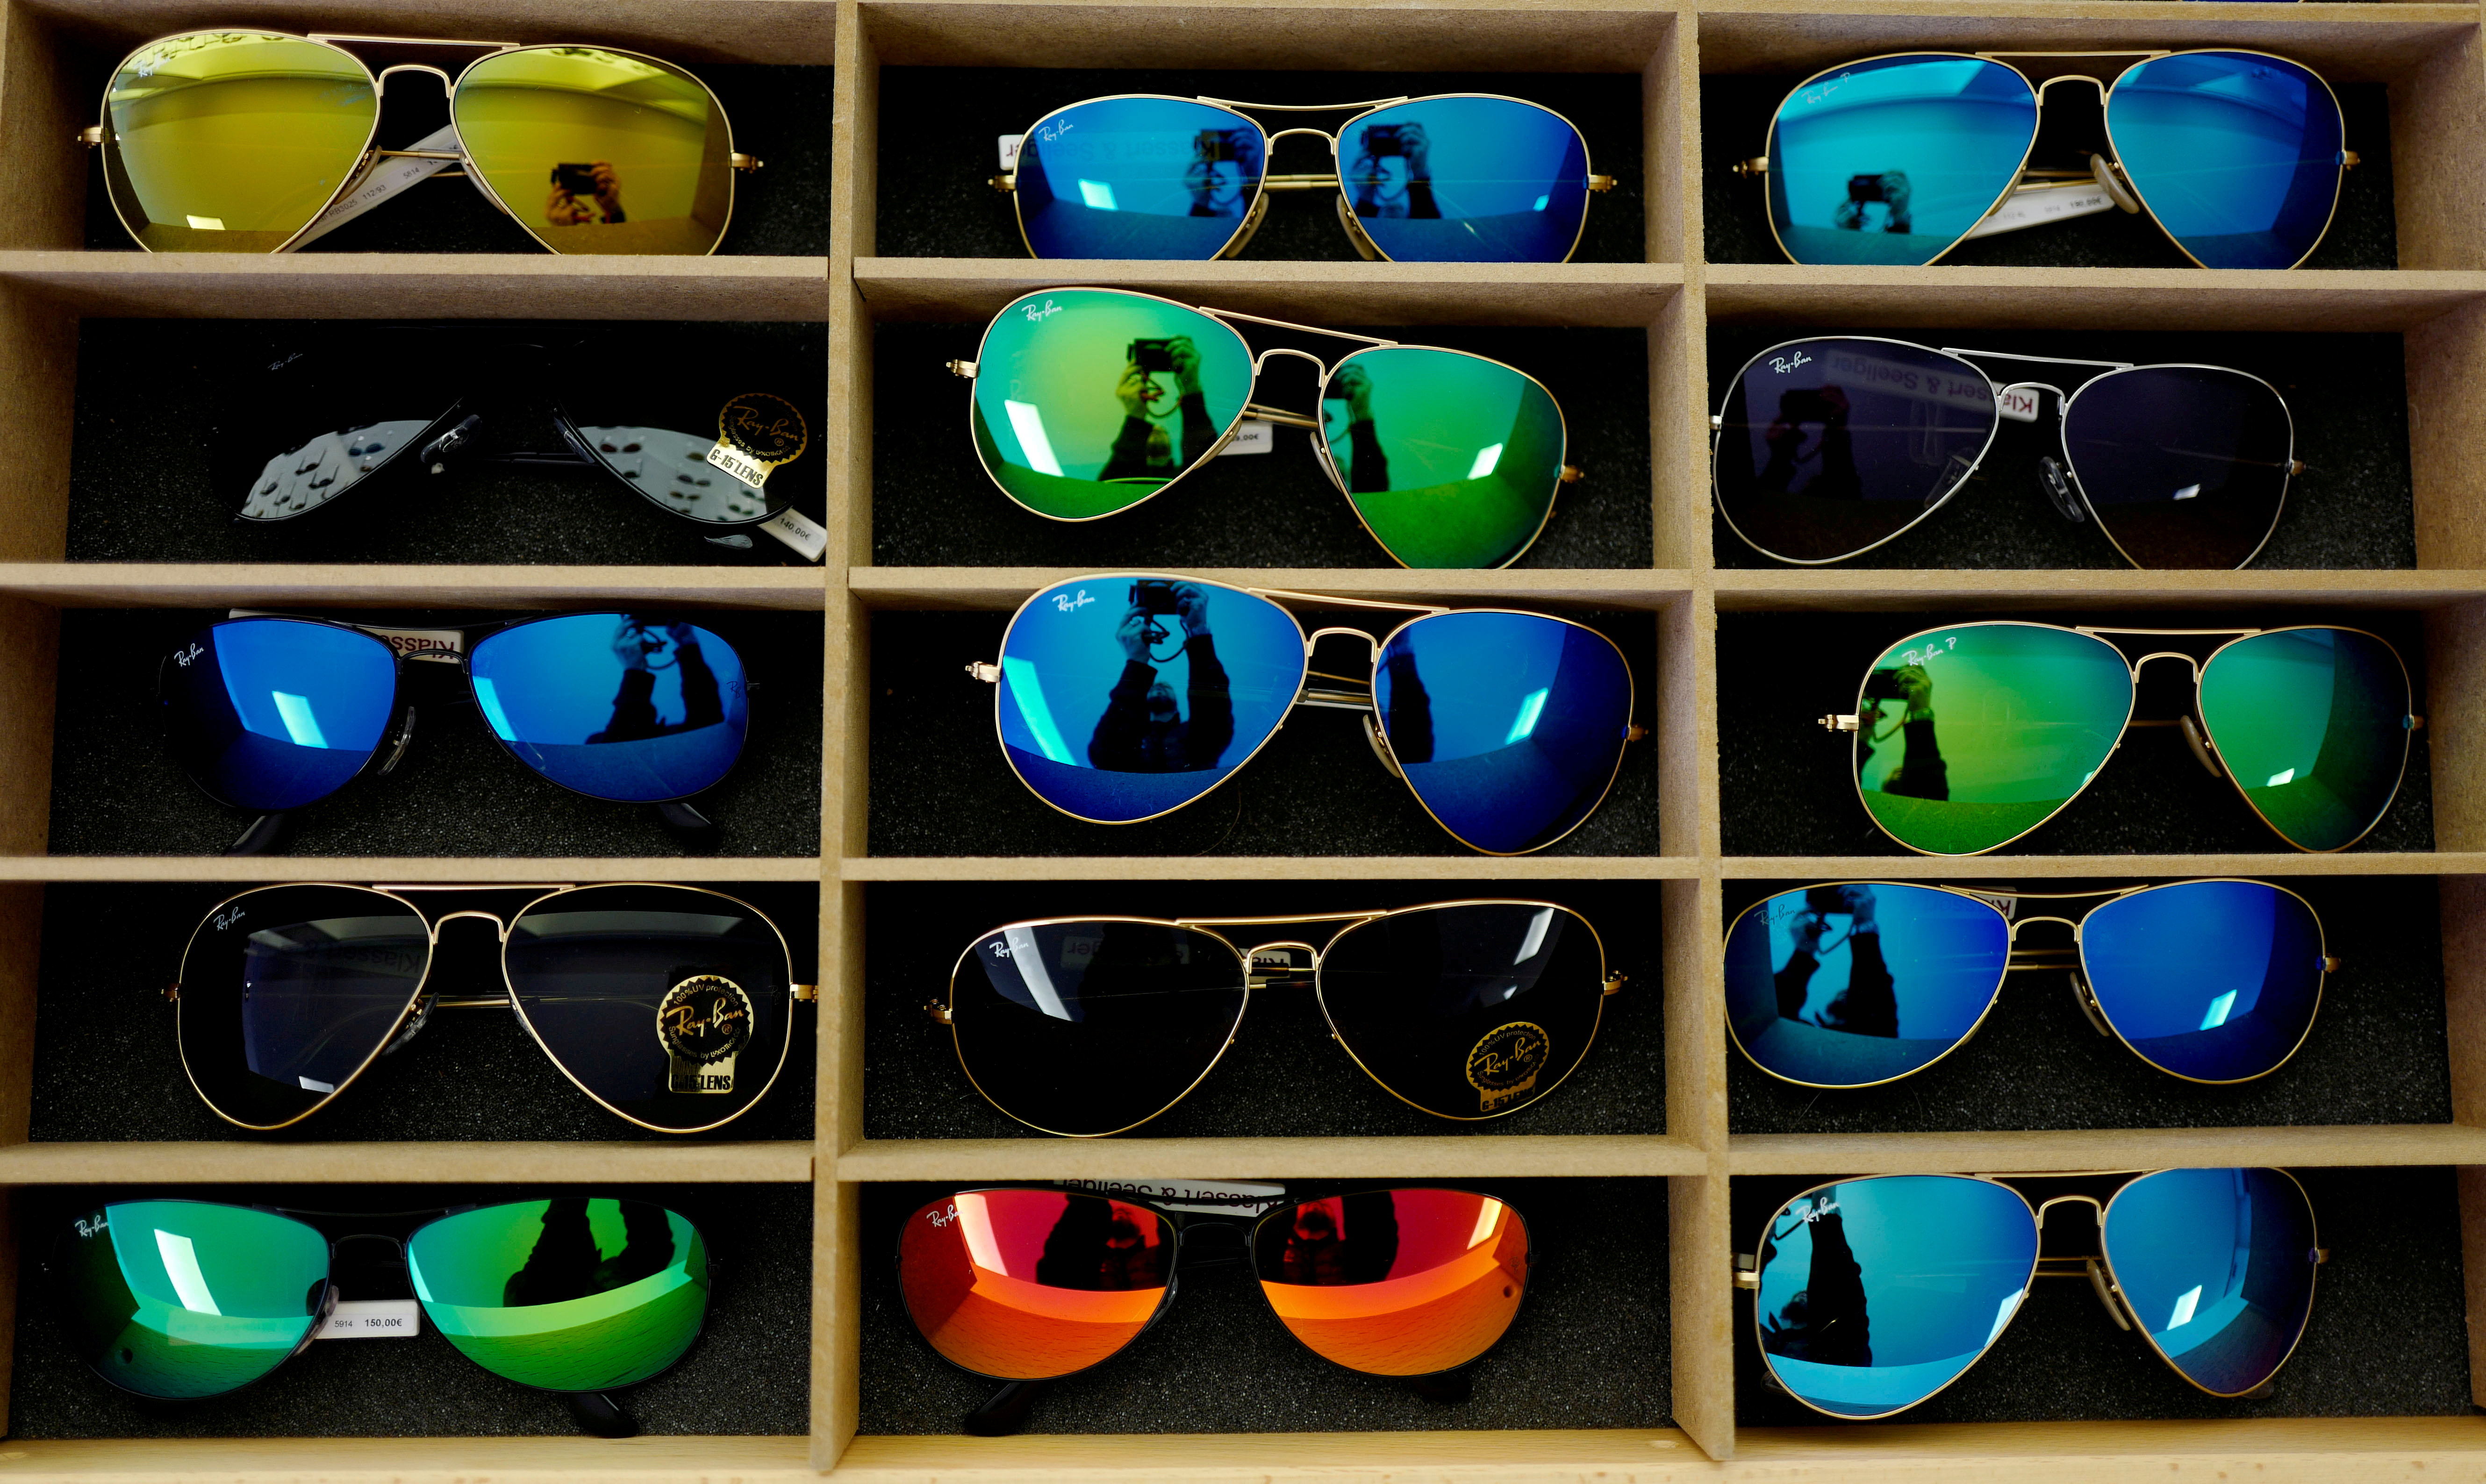 Sunglasses from Ray Ban are on display at a optician shop in Hanau near Frankfurt, Germany, March 18, 2016.  REUTERS/Kai Pfaffenbach